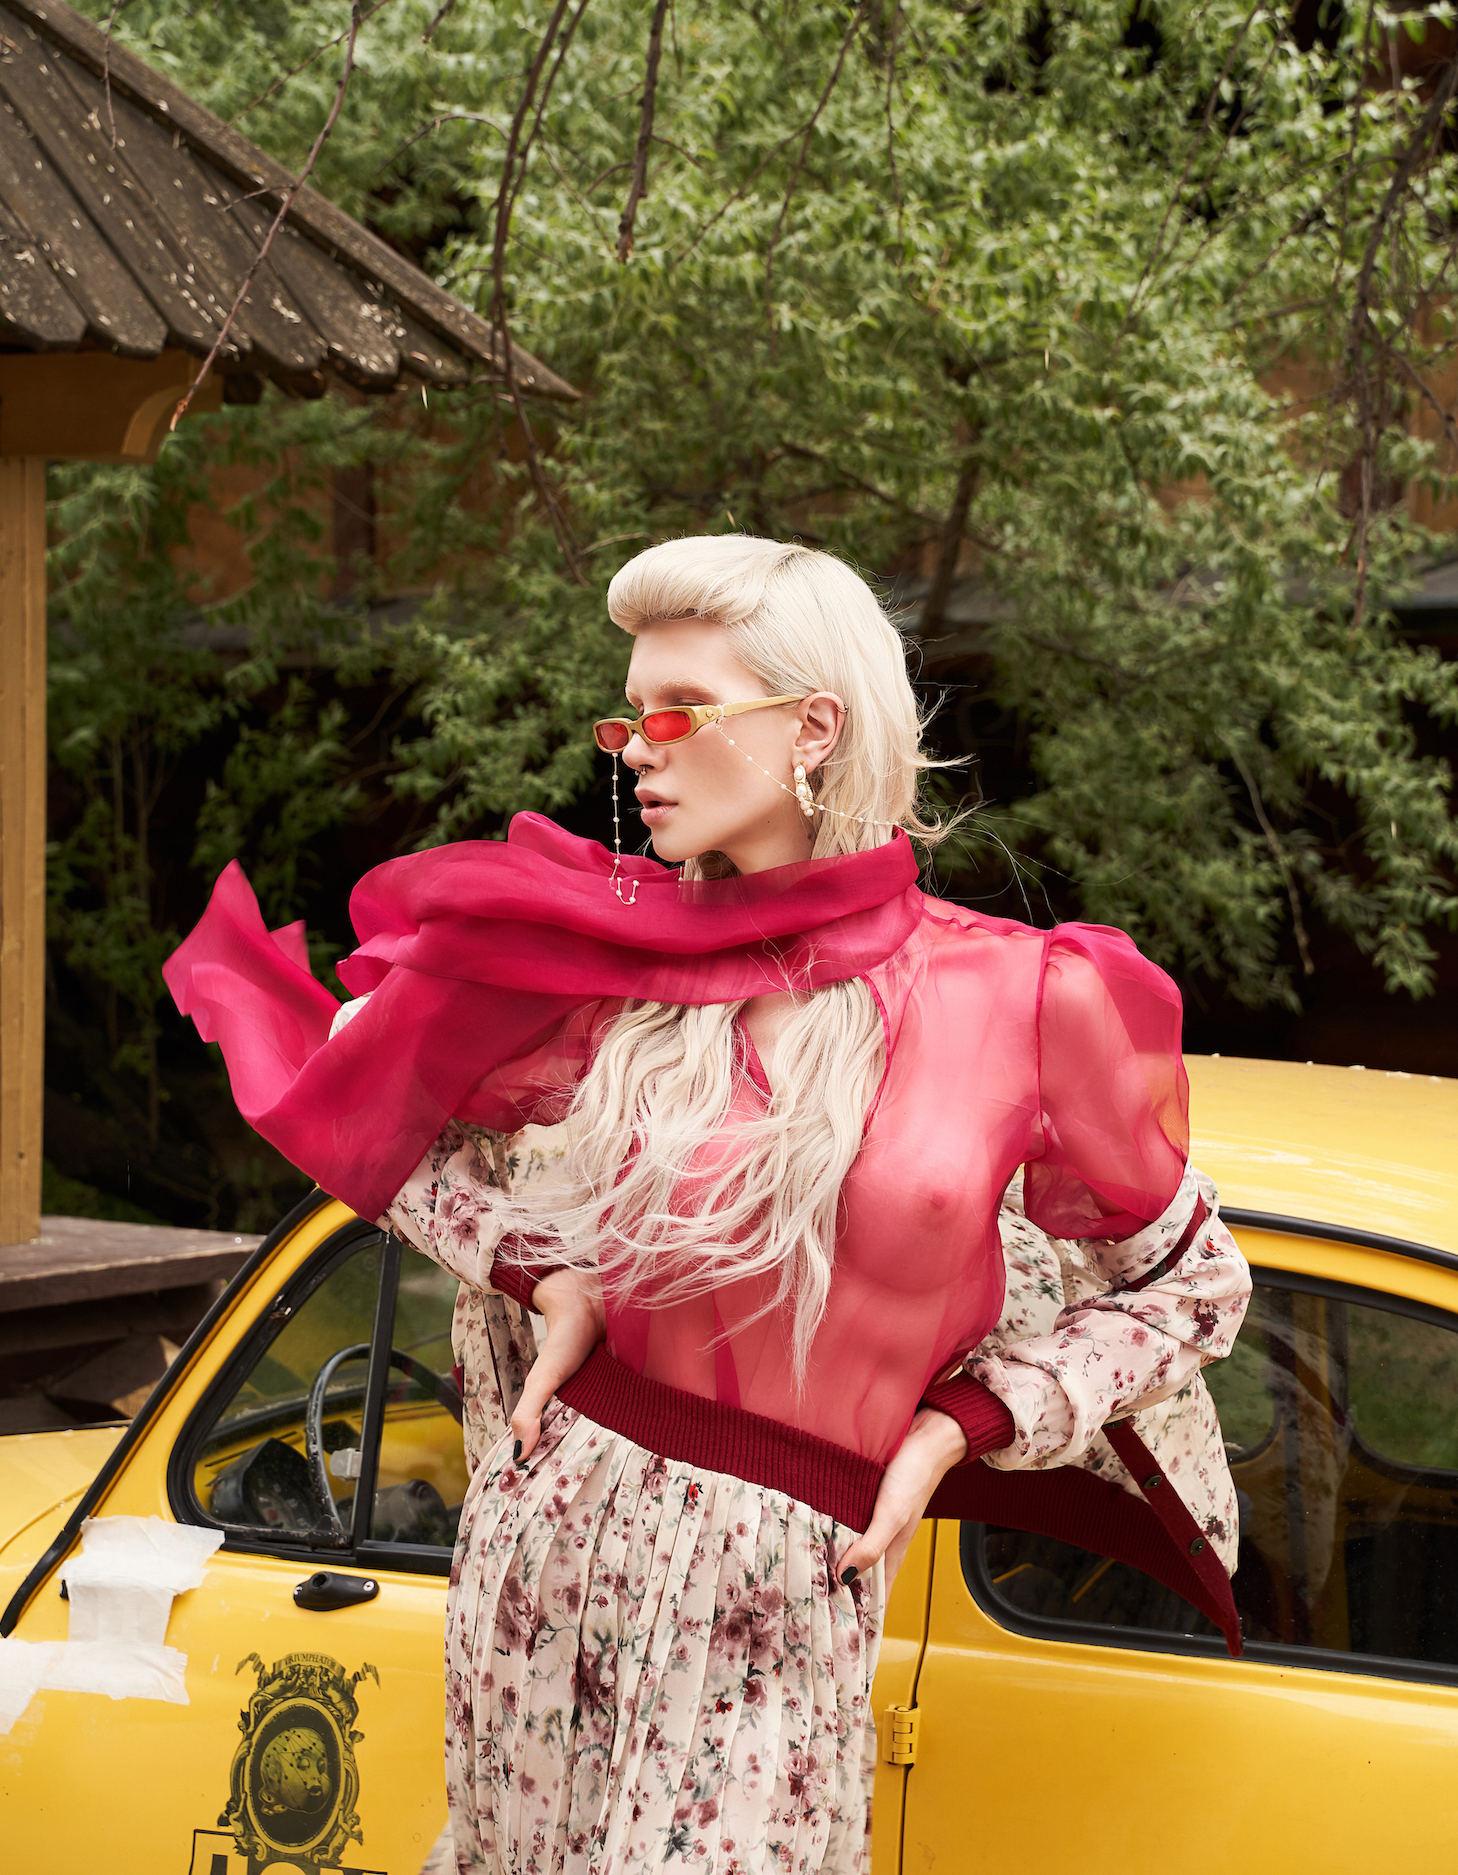 FAKBYFAK x Pilar Zeta  GRACE. Sunglasses. Glossy Red Code: 14/02/06